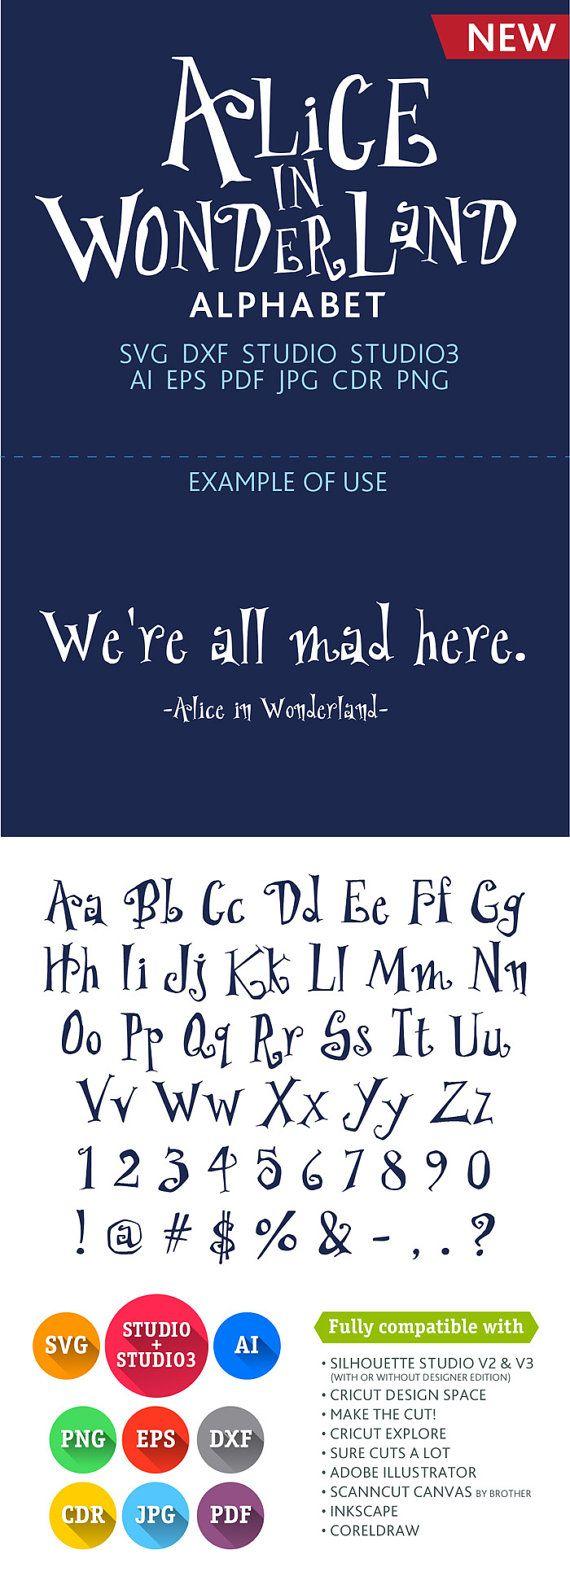 Alice in Wonderland Font Cuttable Alphabet SVG DXF EPS Studio Studio3 Png Pdf Jpg Ai Cdr alphabet files for Silhouette Studio, Cricut, Cameo